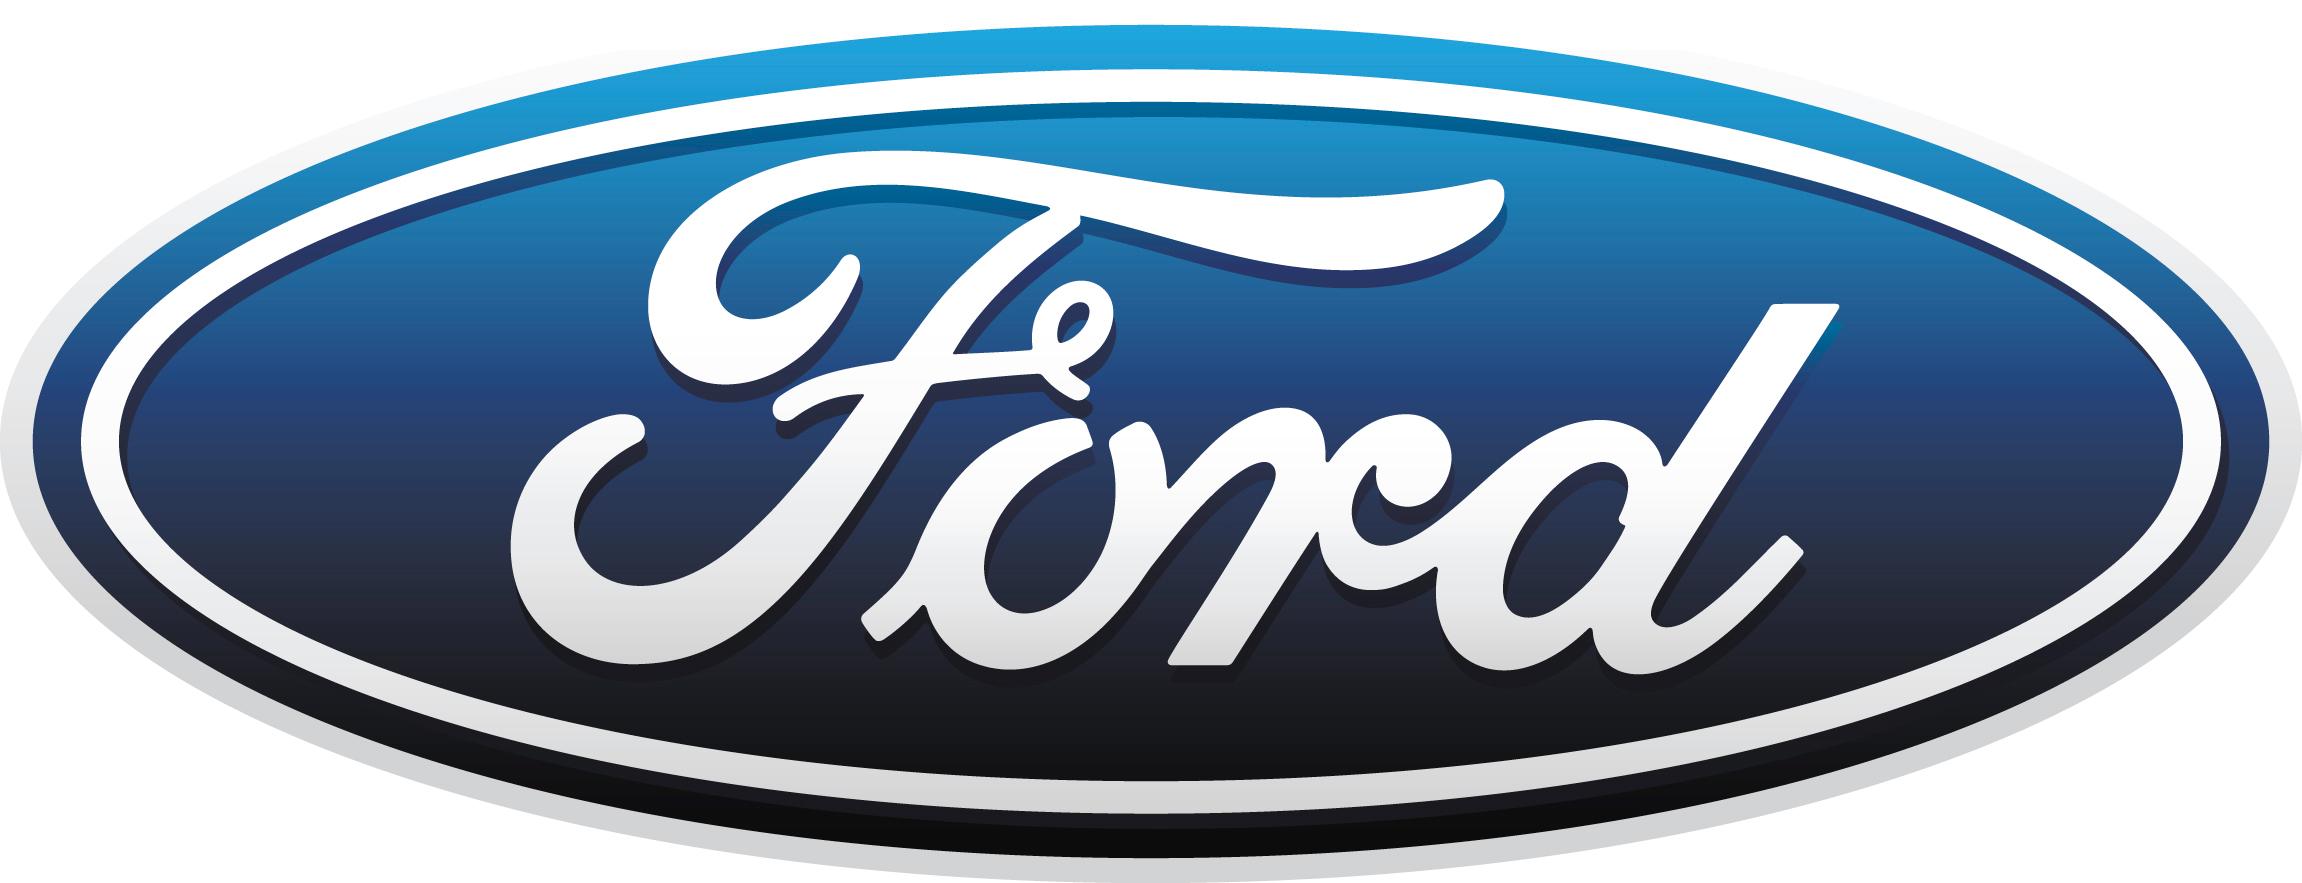 Ford car logo PNG brand image - Car Logo PNG